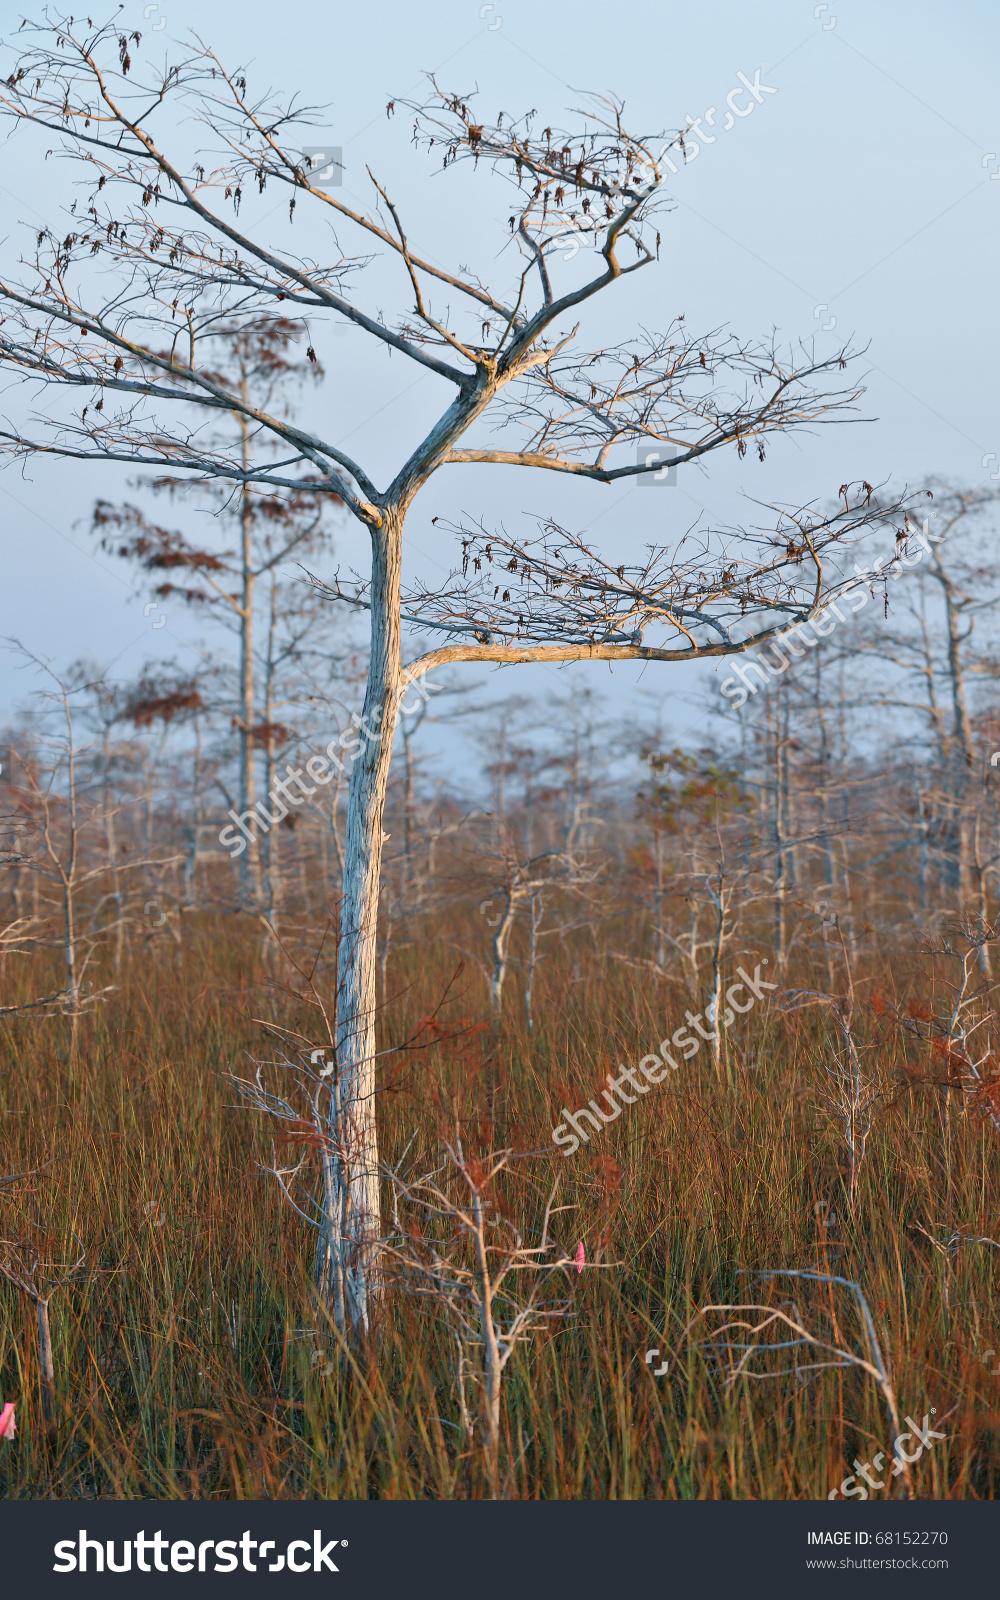 Dwarf Cypress Tree In Winter Dormancy At Florida'S Everglades.